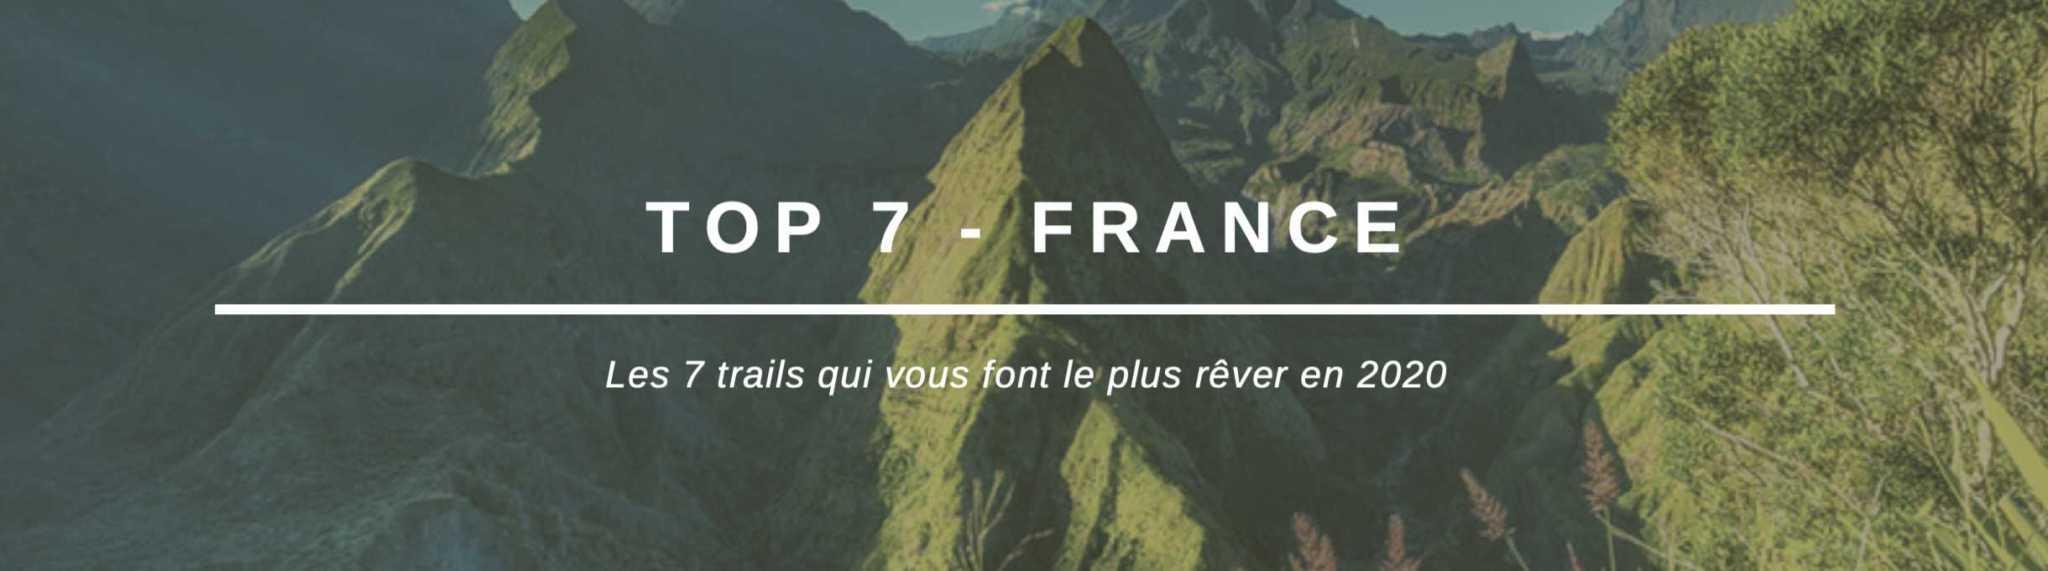 TOP 7 de trails en France